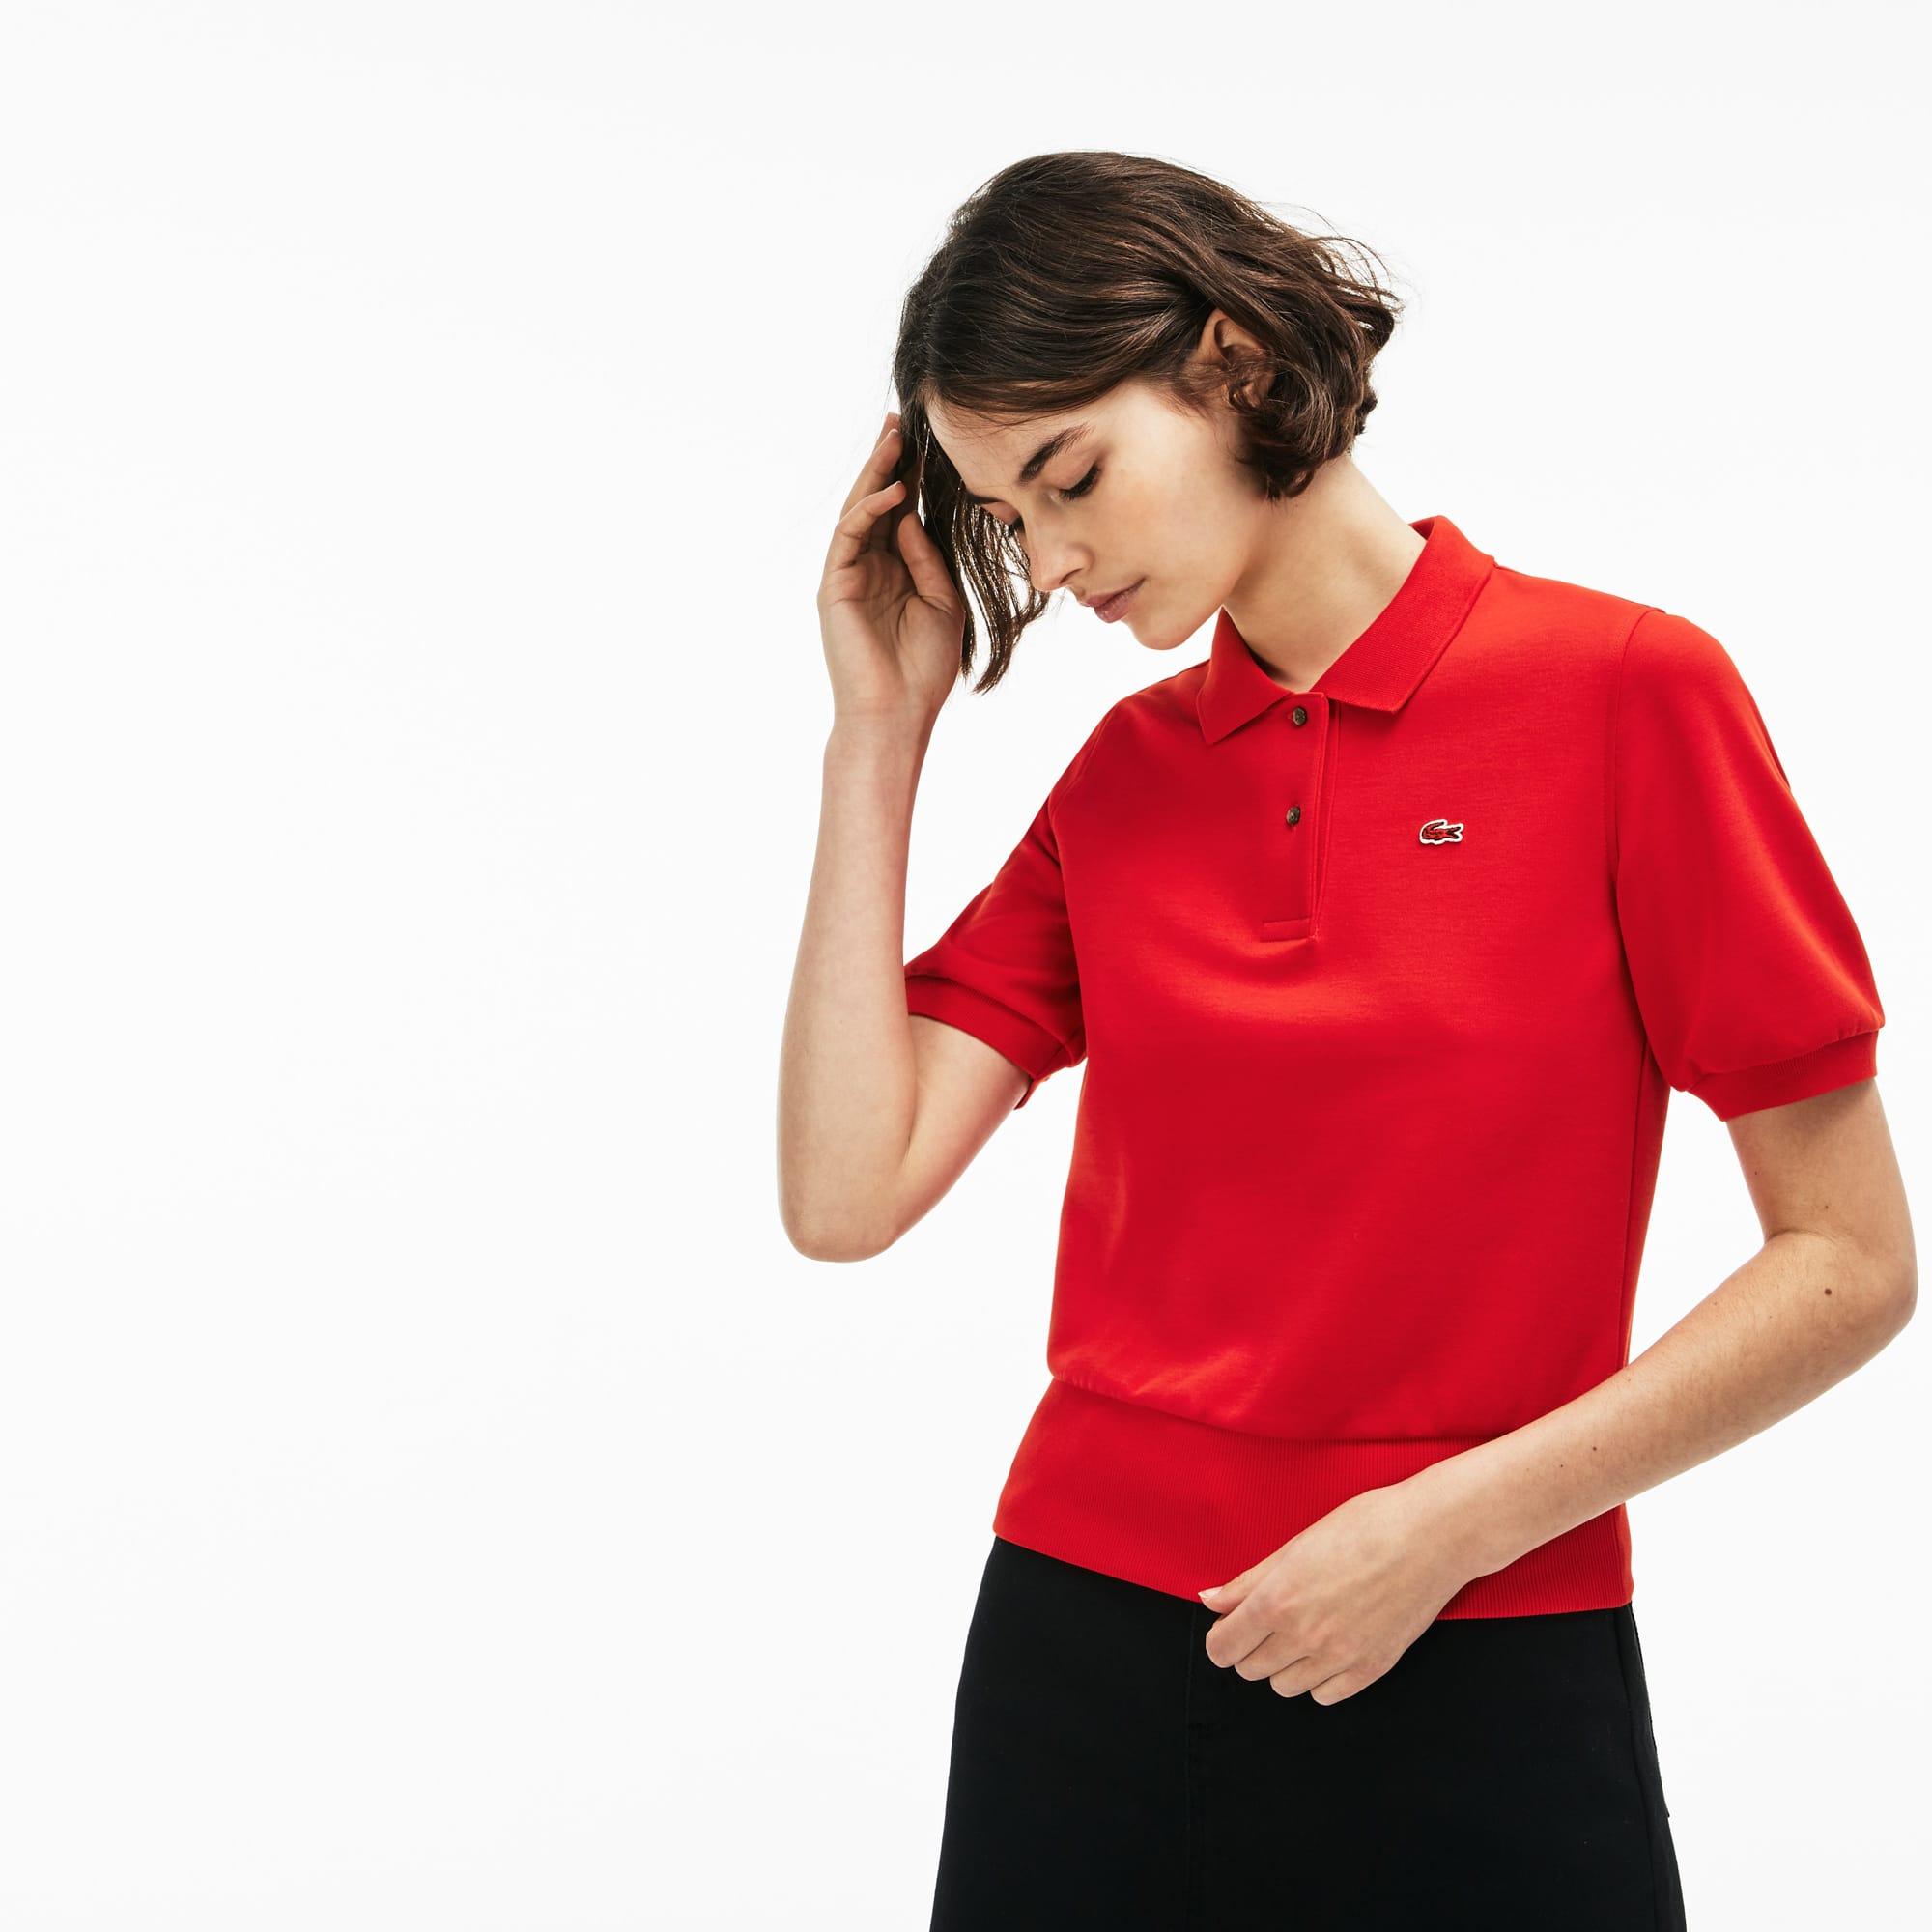 Damen LACOSTE L!VE zweilagige Boxy Fit Jersey-Poloshirt